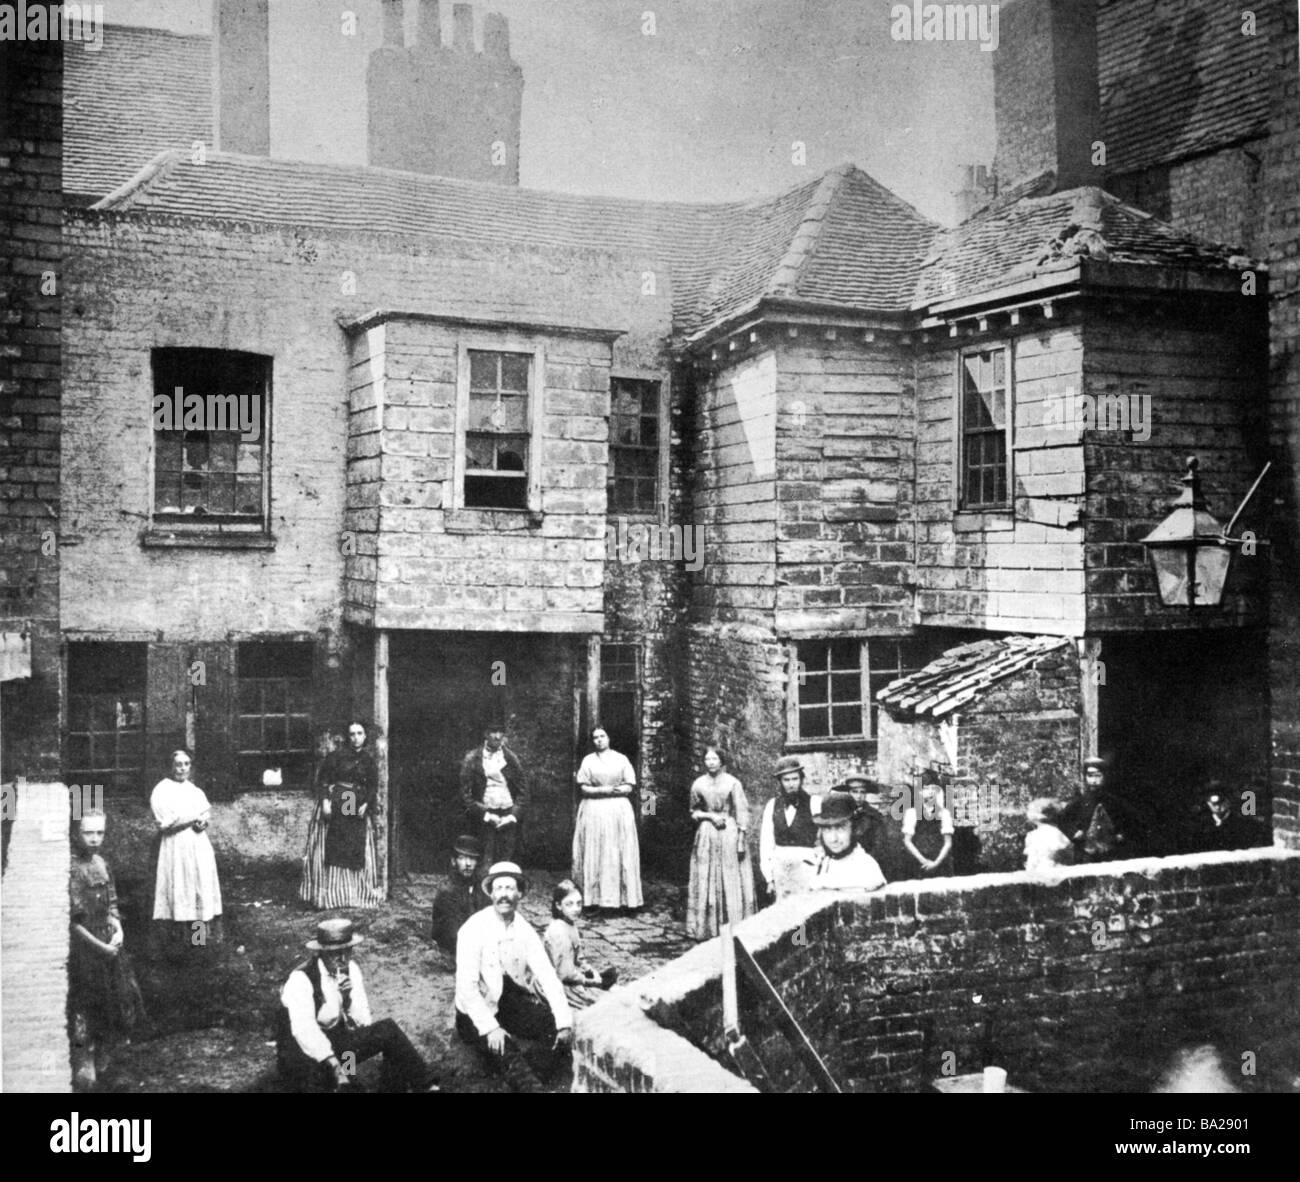 Street Housing: Market Street, Kensington, London Late